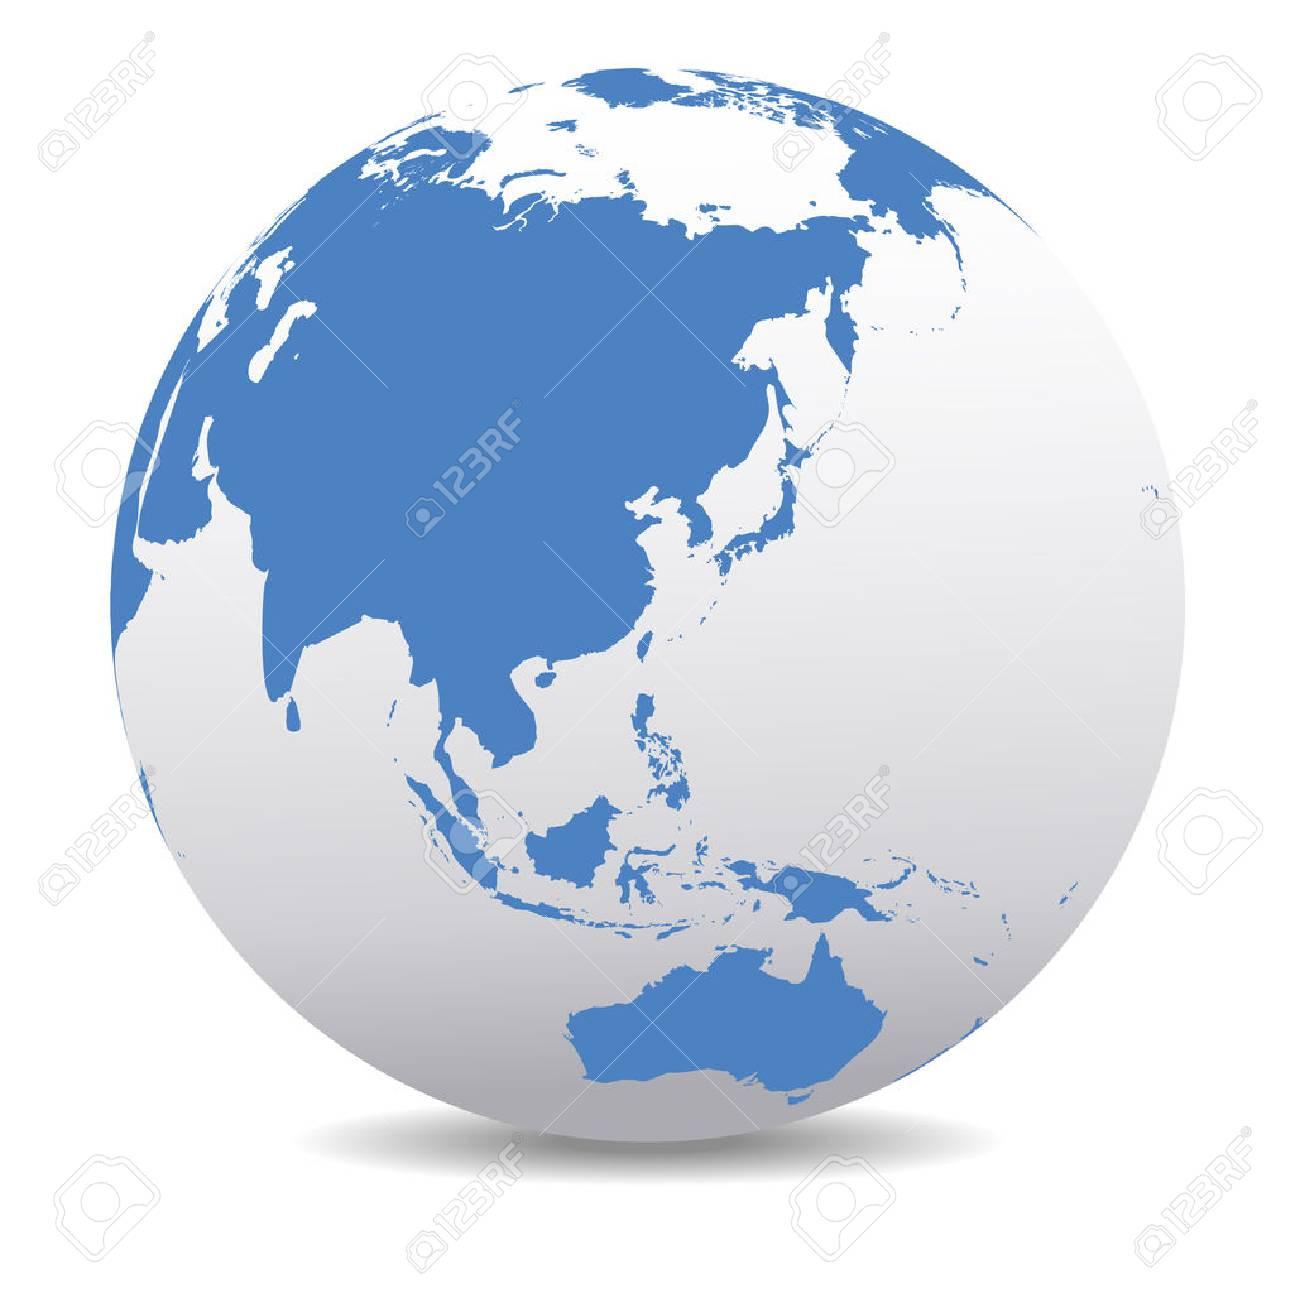 China, Malaysia, Thailand, Indonesia, Global World - 36051704